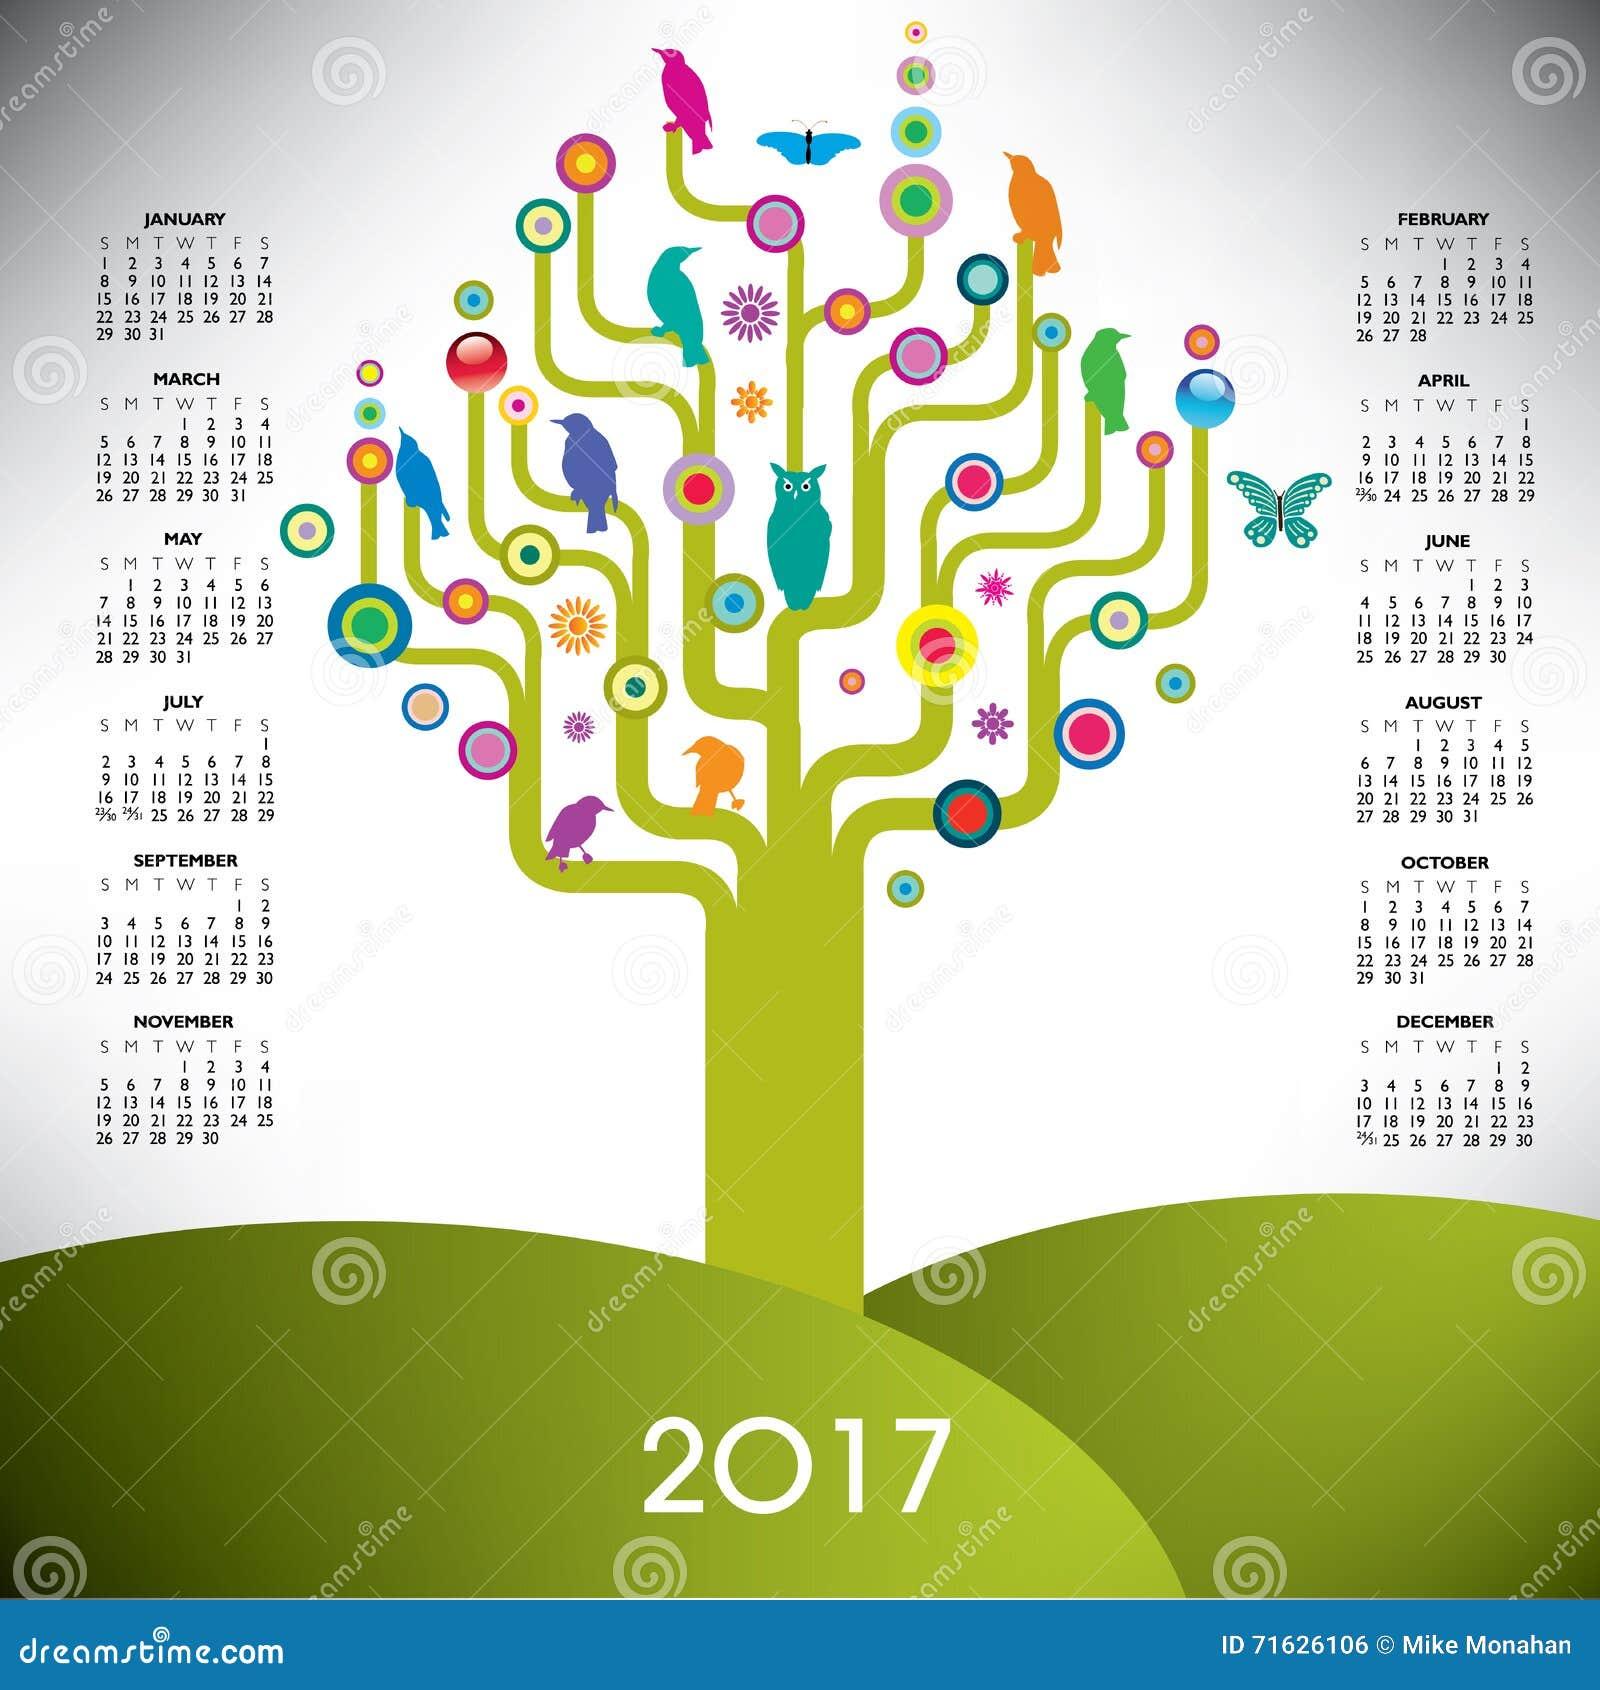 2017 Colorful Tree Calendar Stock Vector - Illustration of american ...